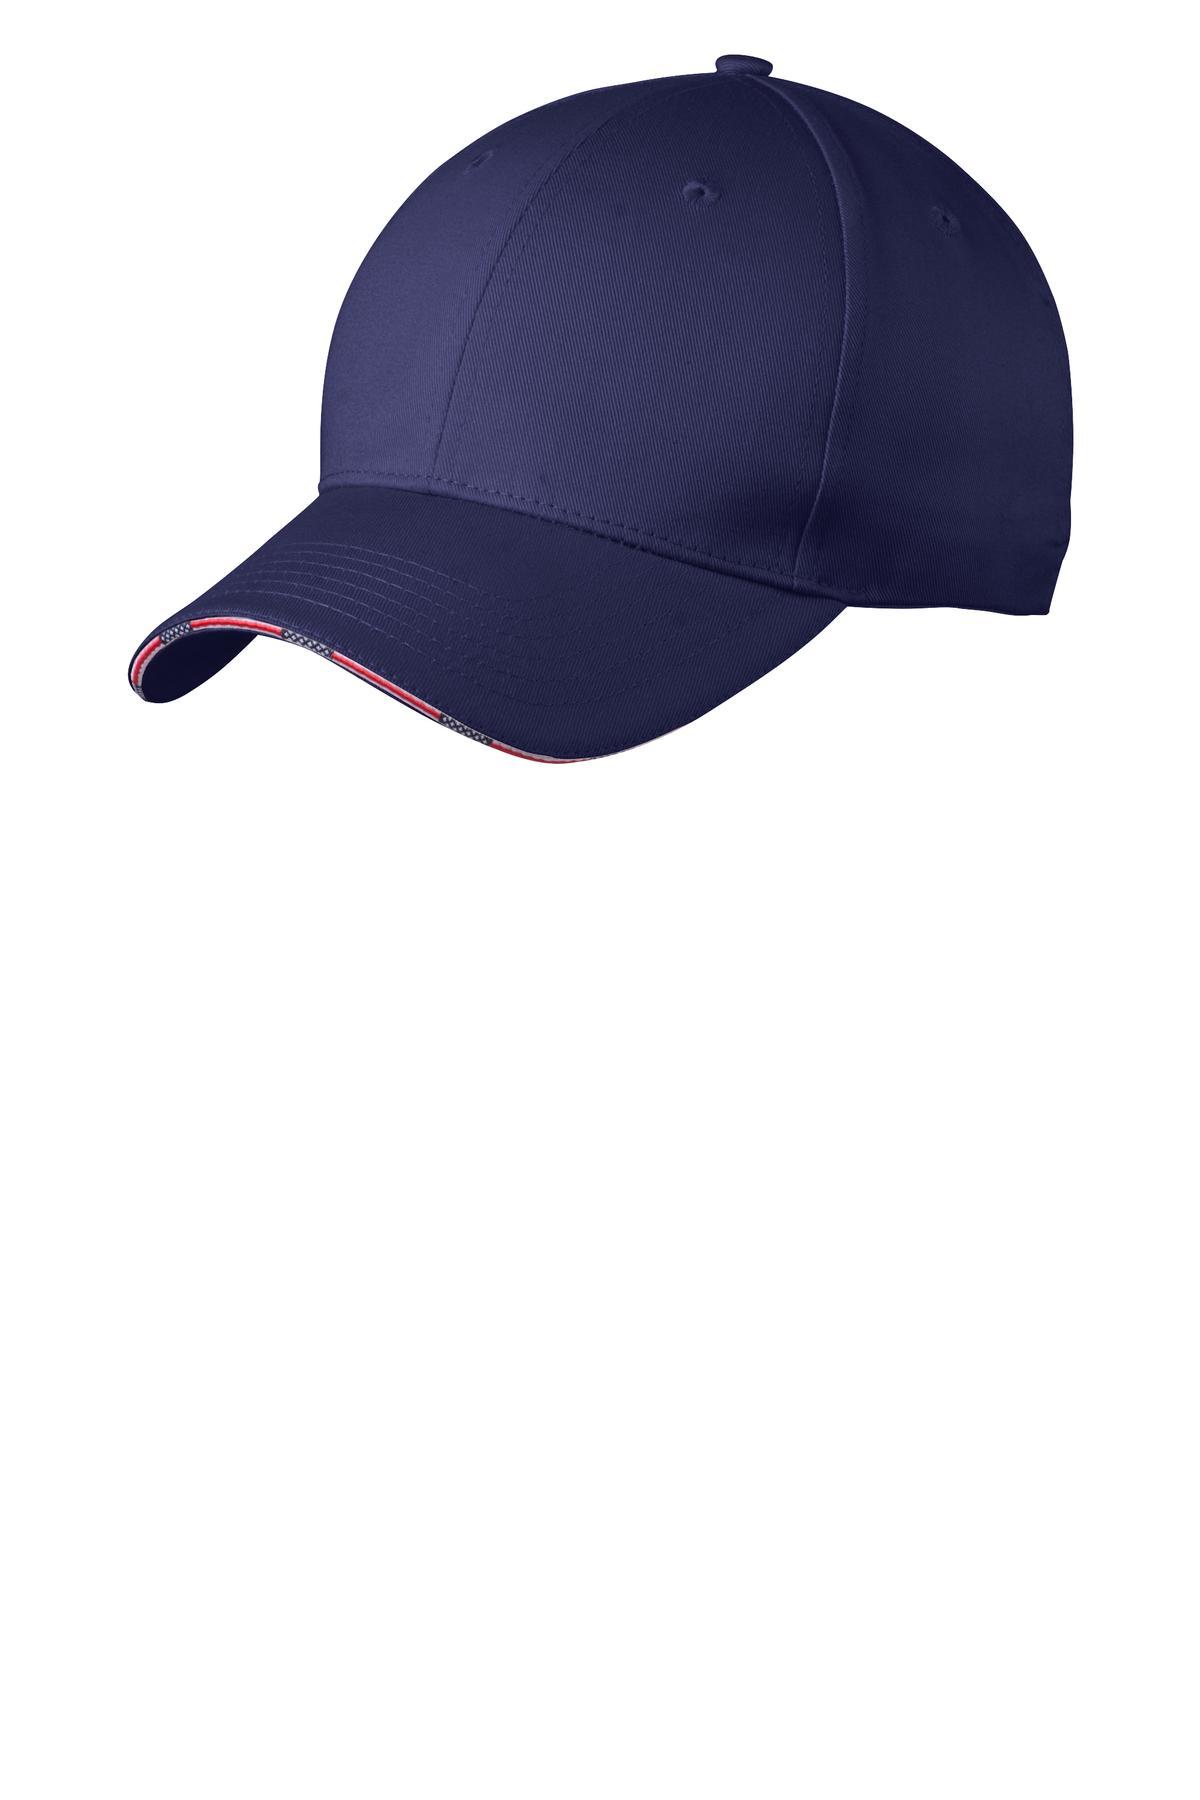 337b6a4aa92 Port Authority ® Americana Flag Sandwich Cap. C829 - Custom Shirt Shop